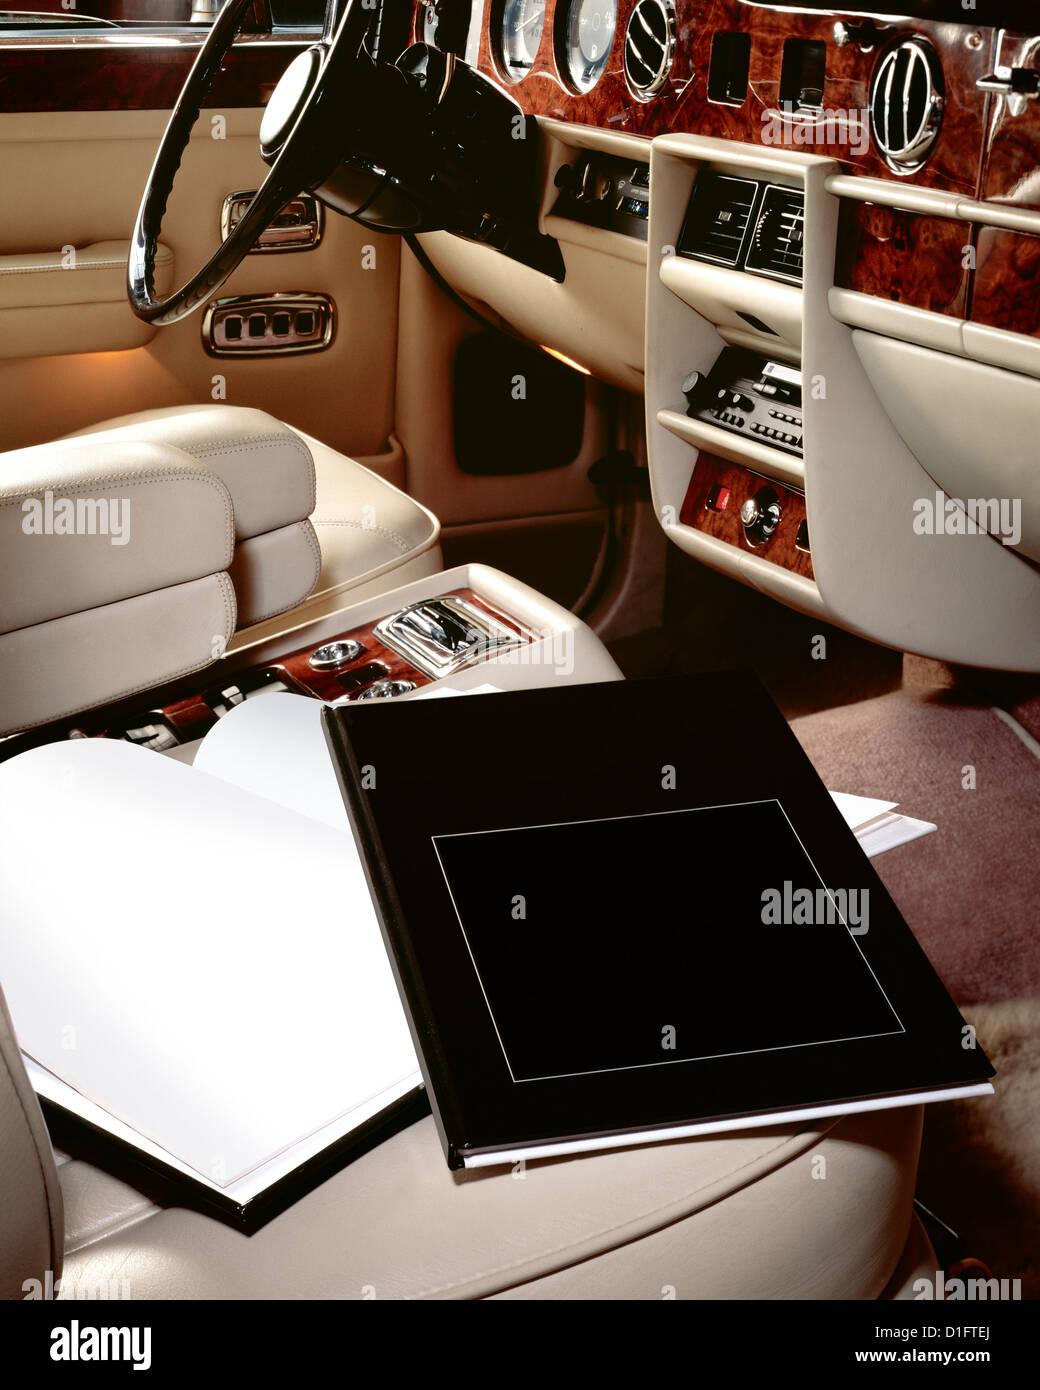 Luxury Car Interior With Books On Seat Stock Photo Alamy